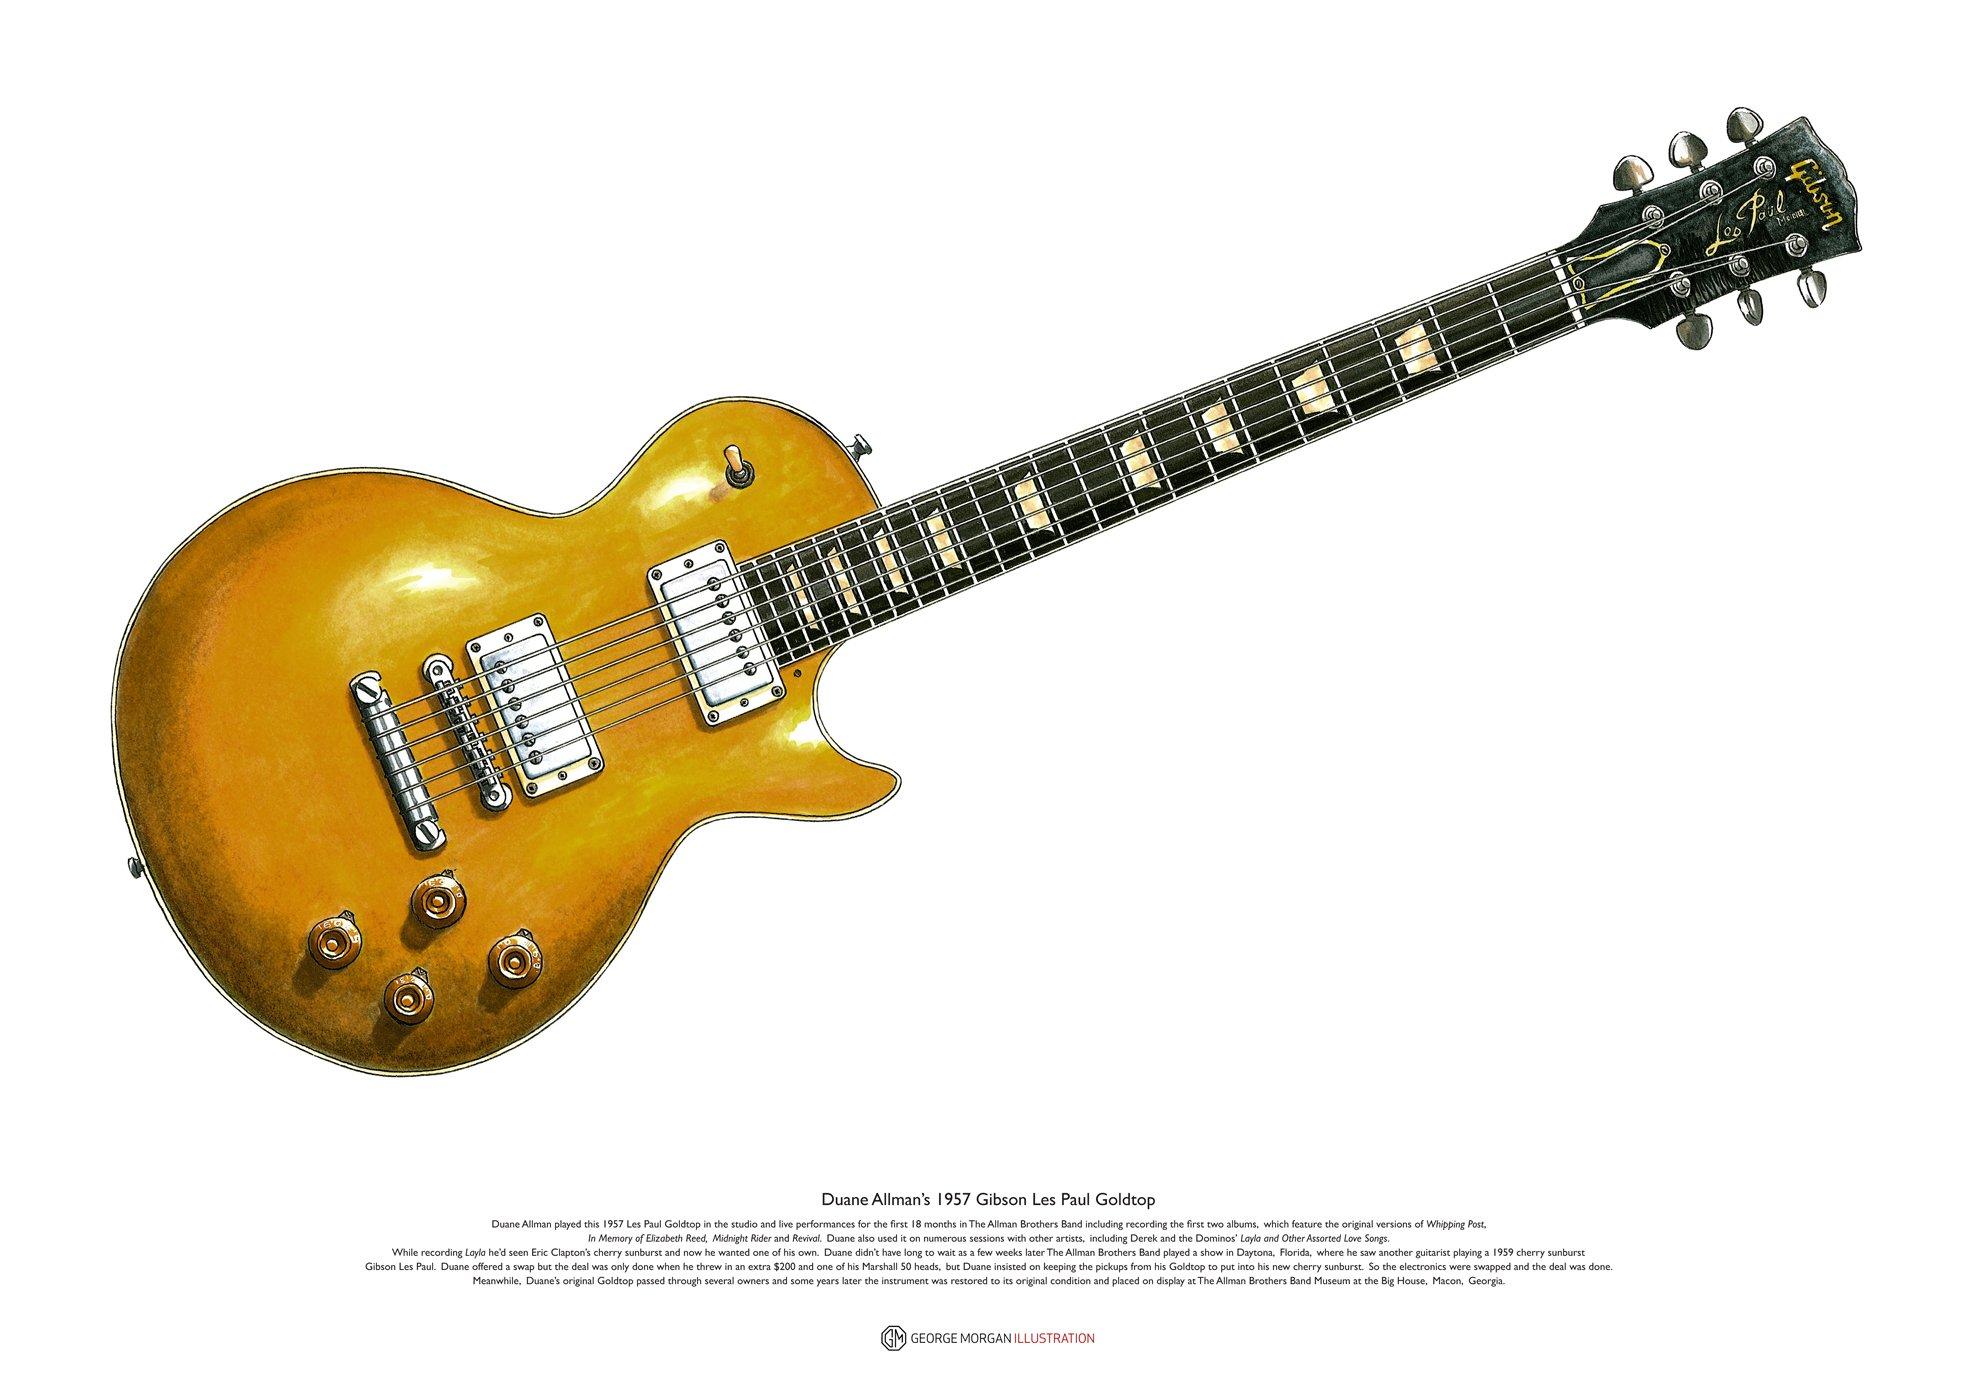 George Morgan Illustration Duane Allman 1957 Gibson Les Paul ...